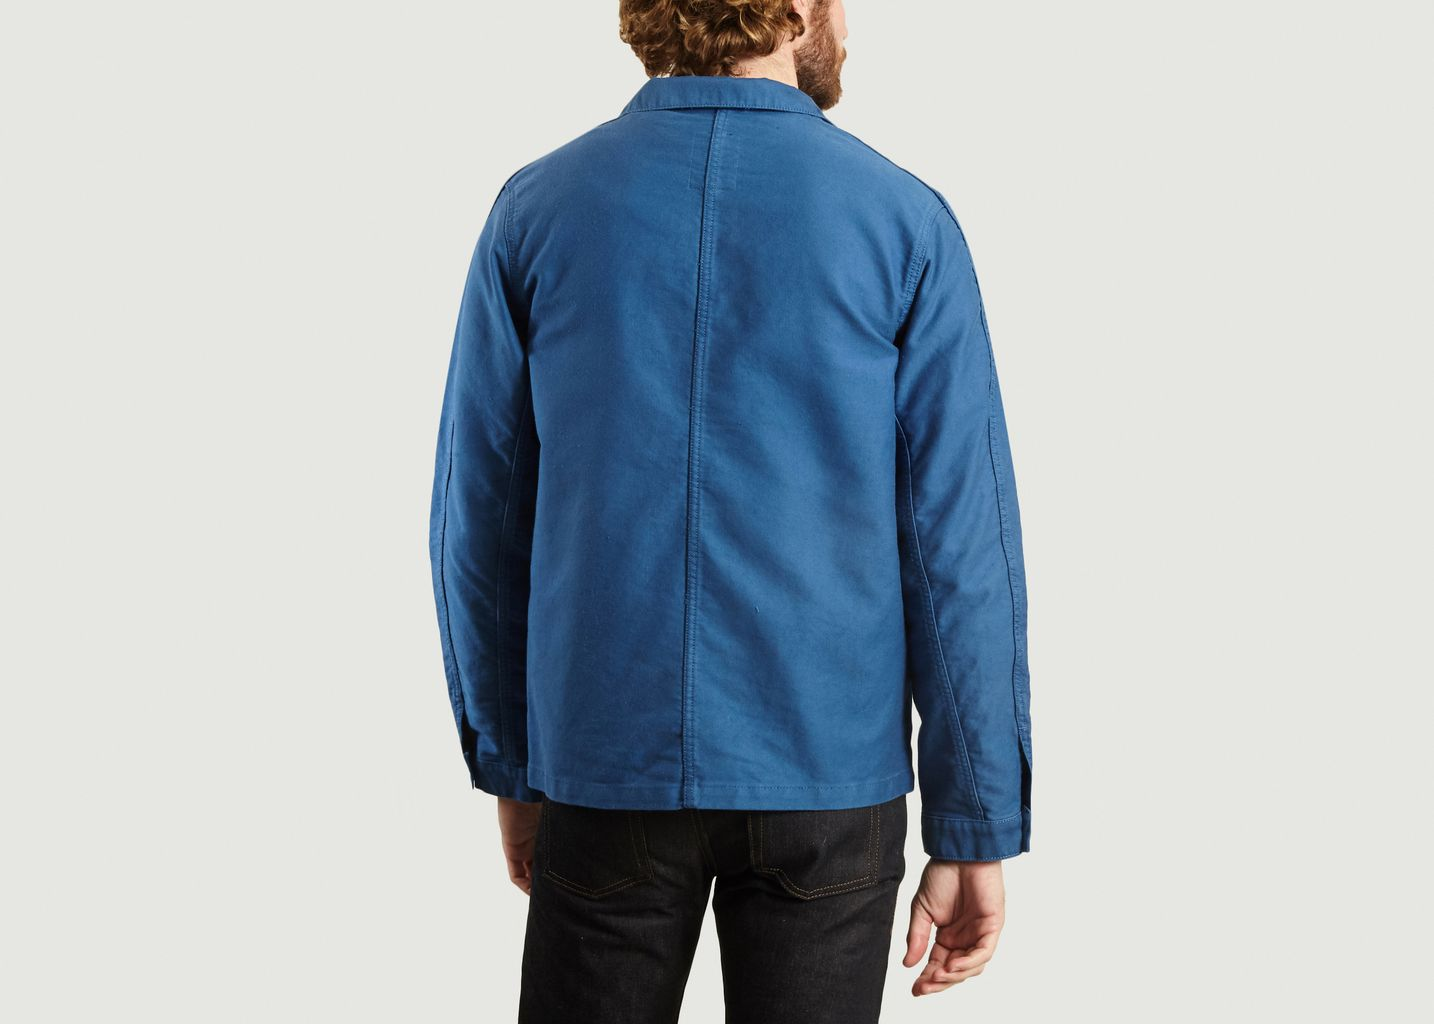 Veste de comptoir moleskine - Bleu de Paname